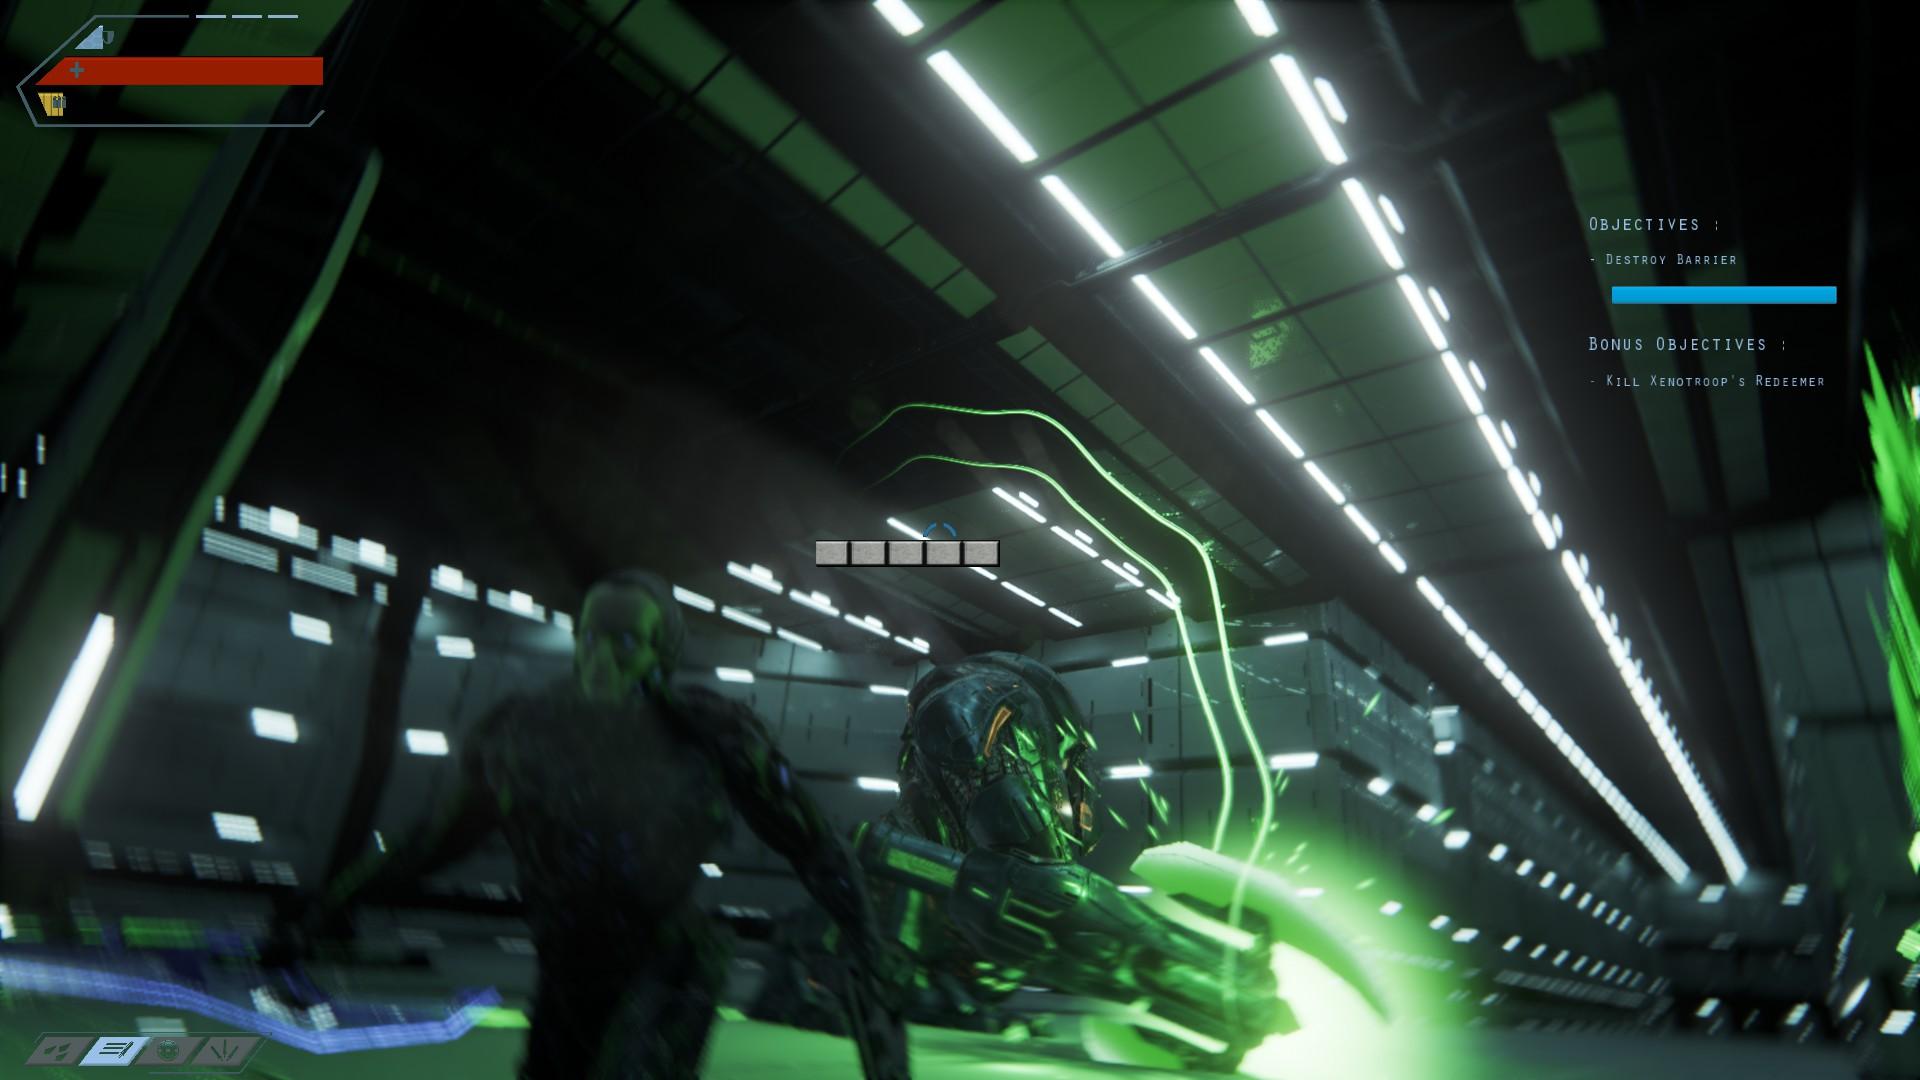 The Admin screenshot